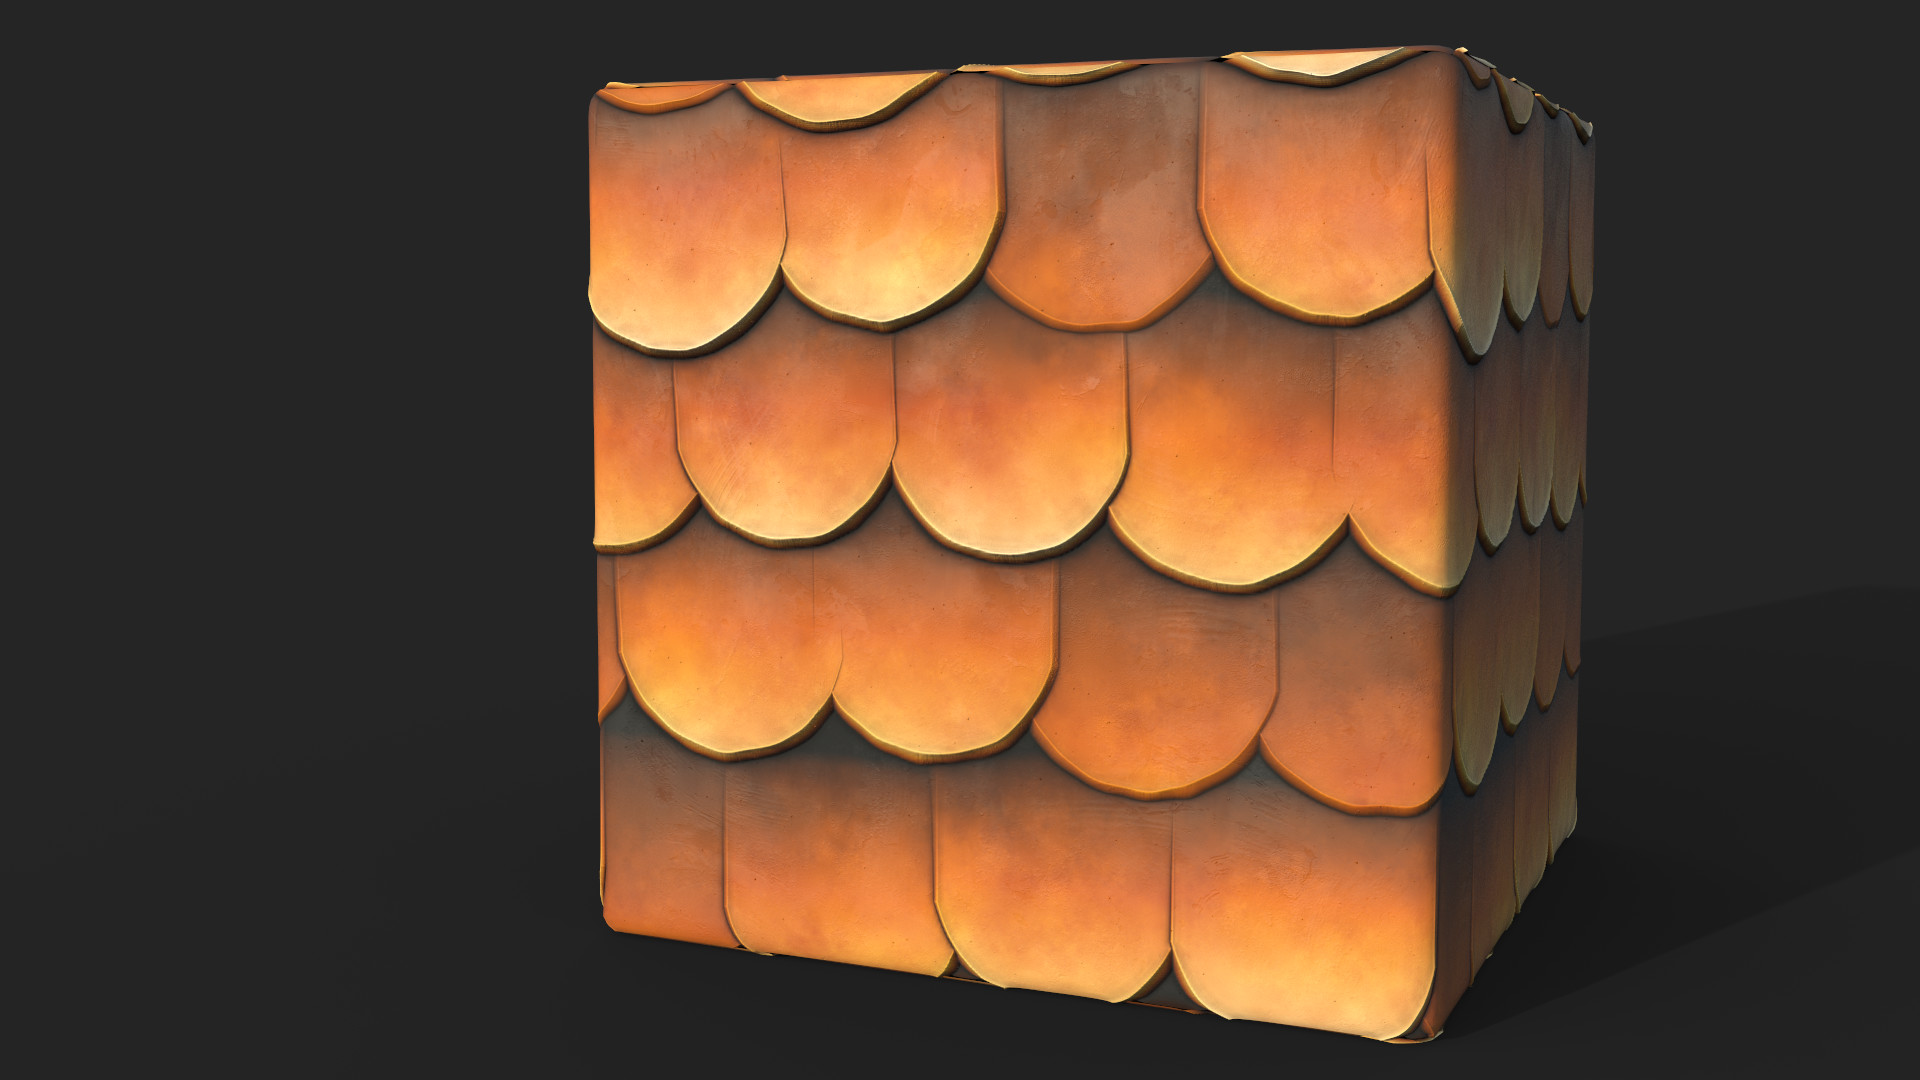 Matej chalachan tiles roof iray